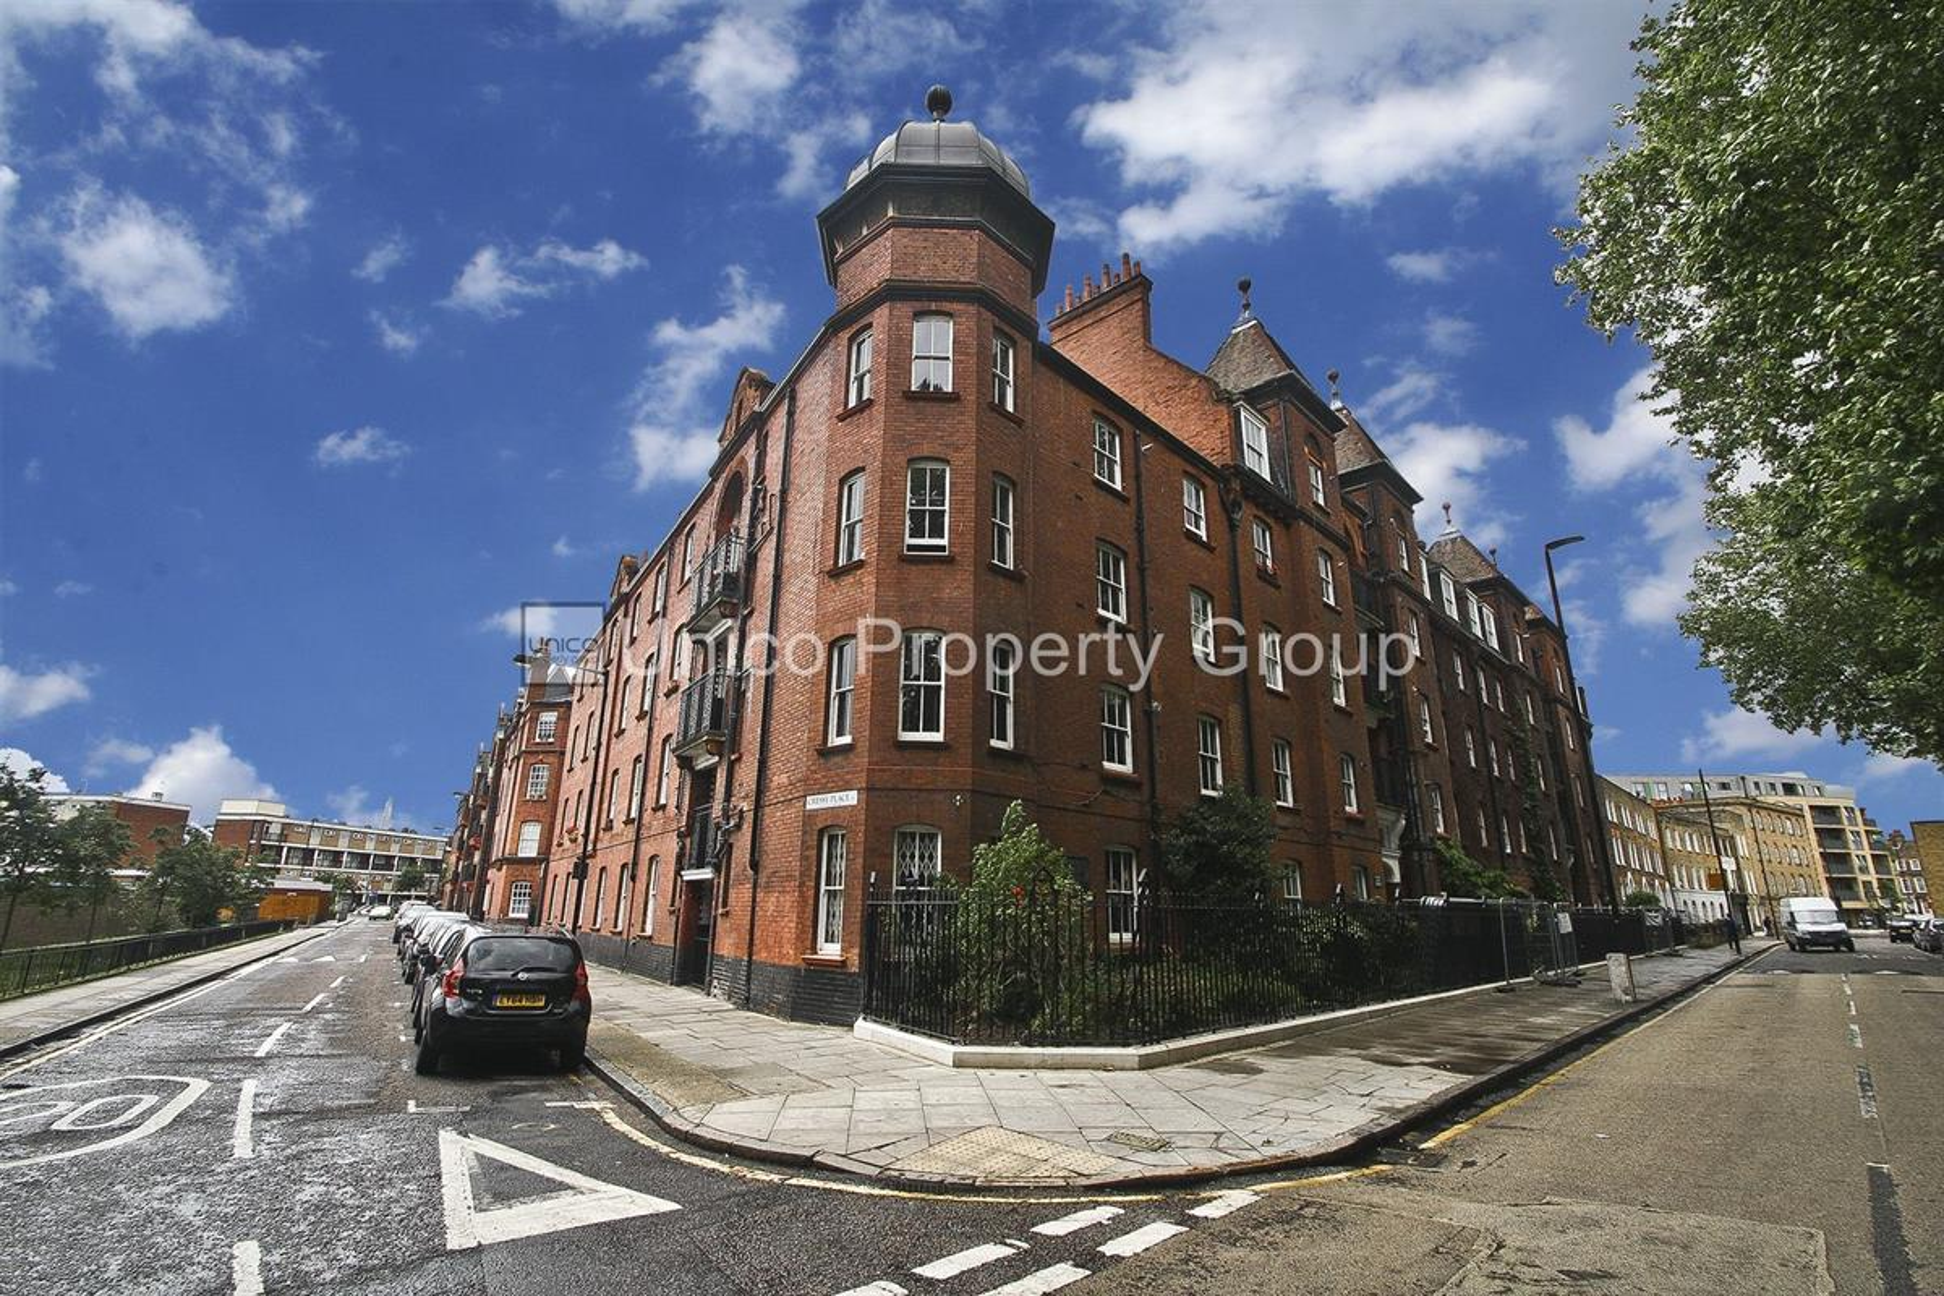 Dunstan Houses, Stepney Green, London